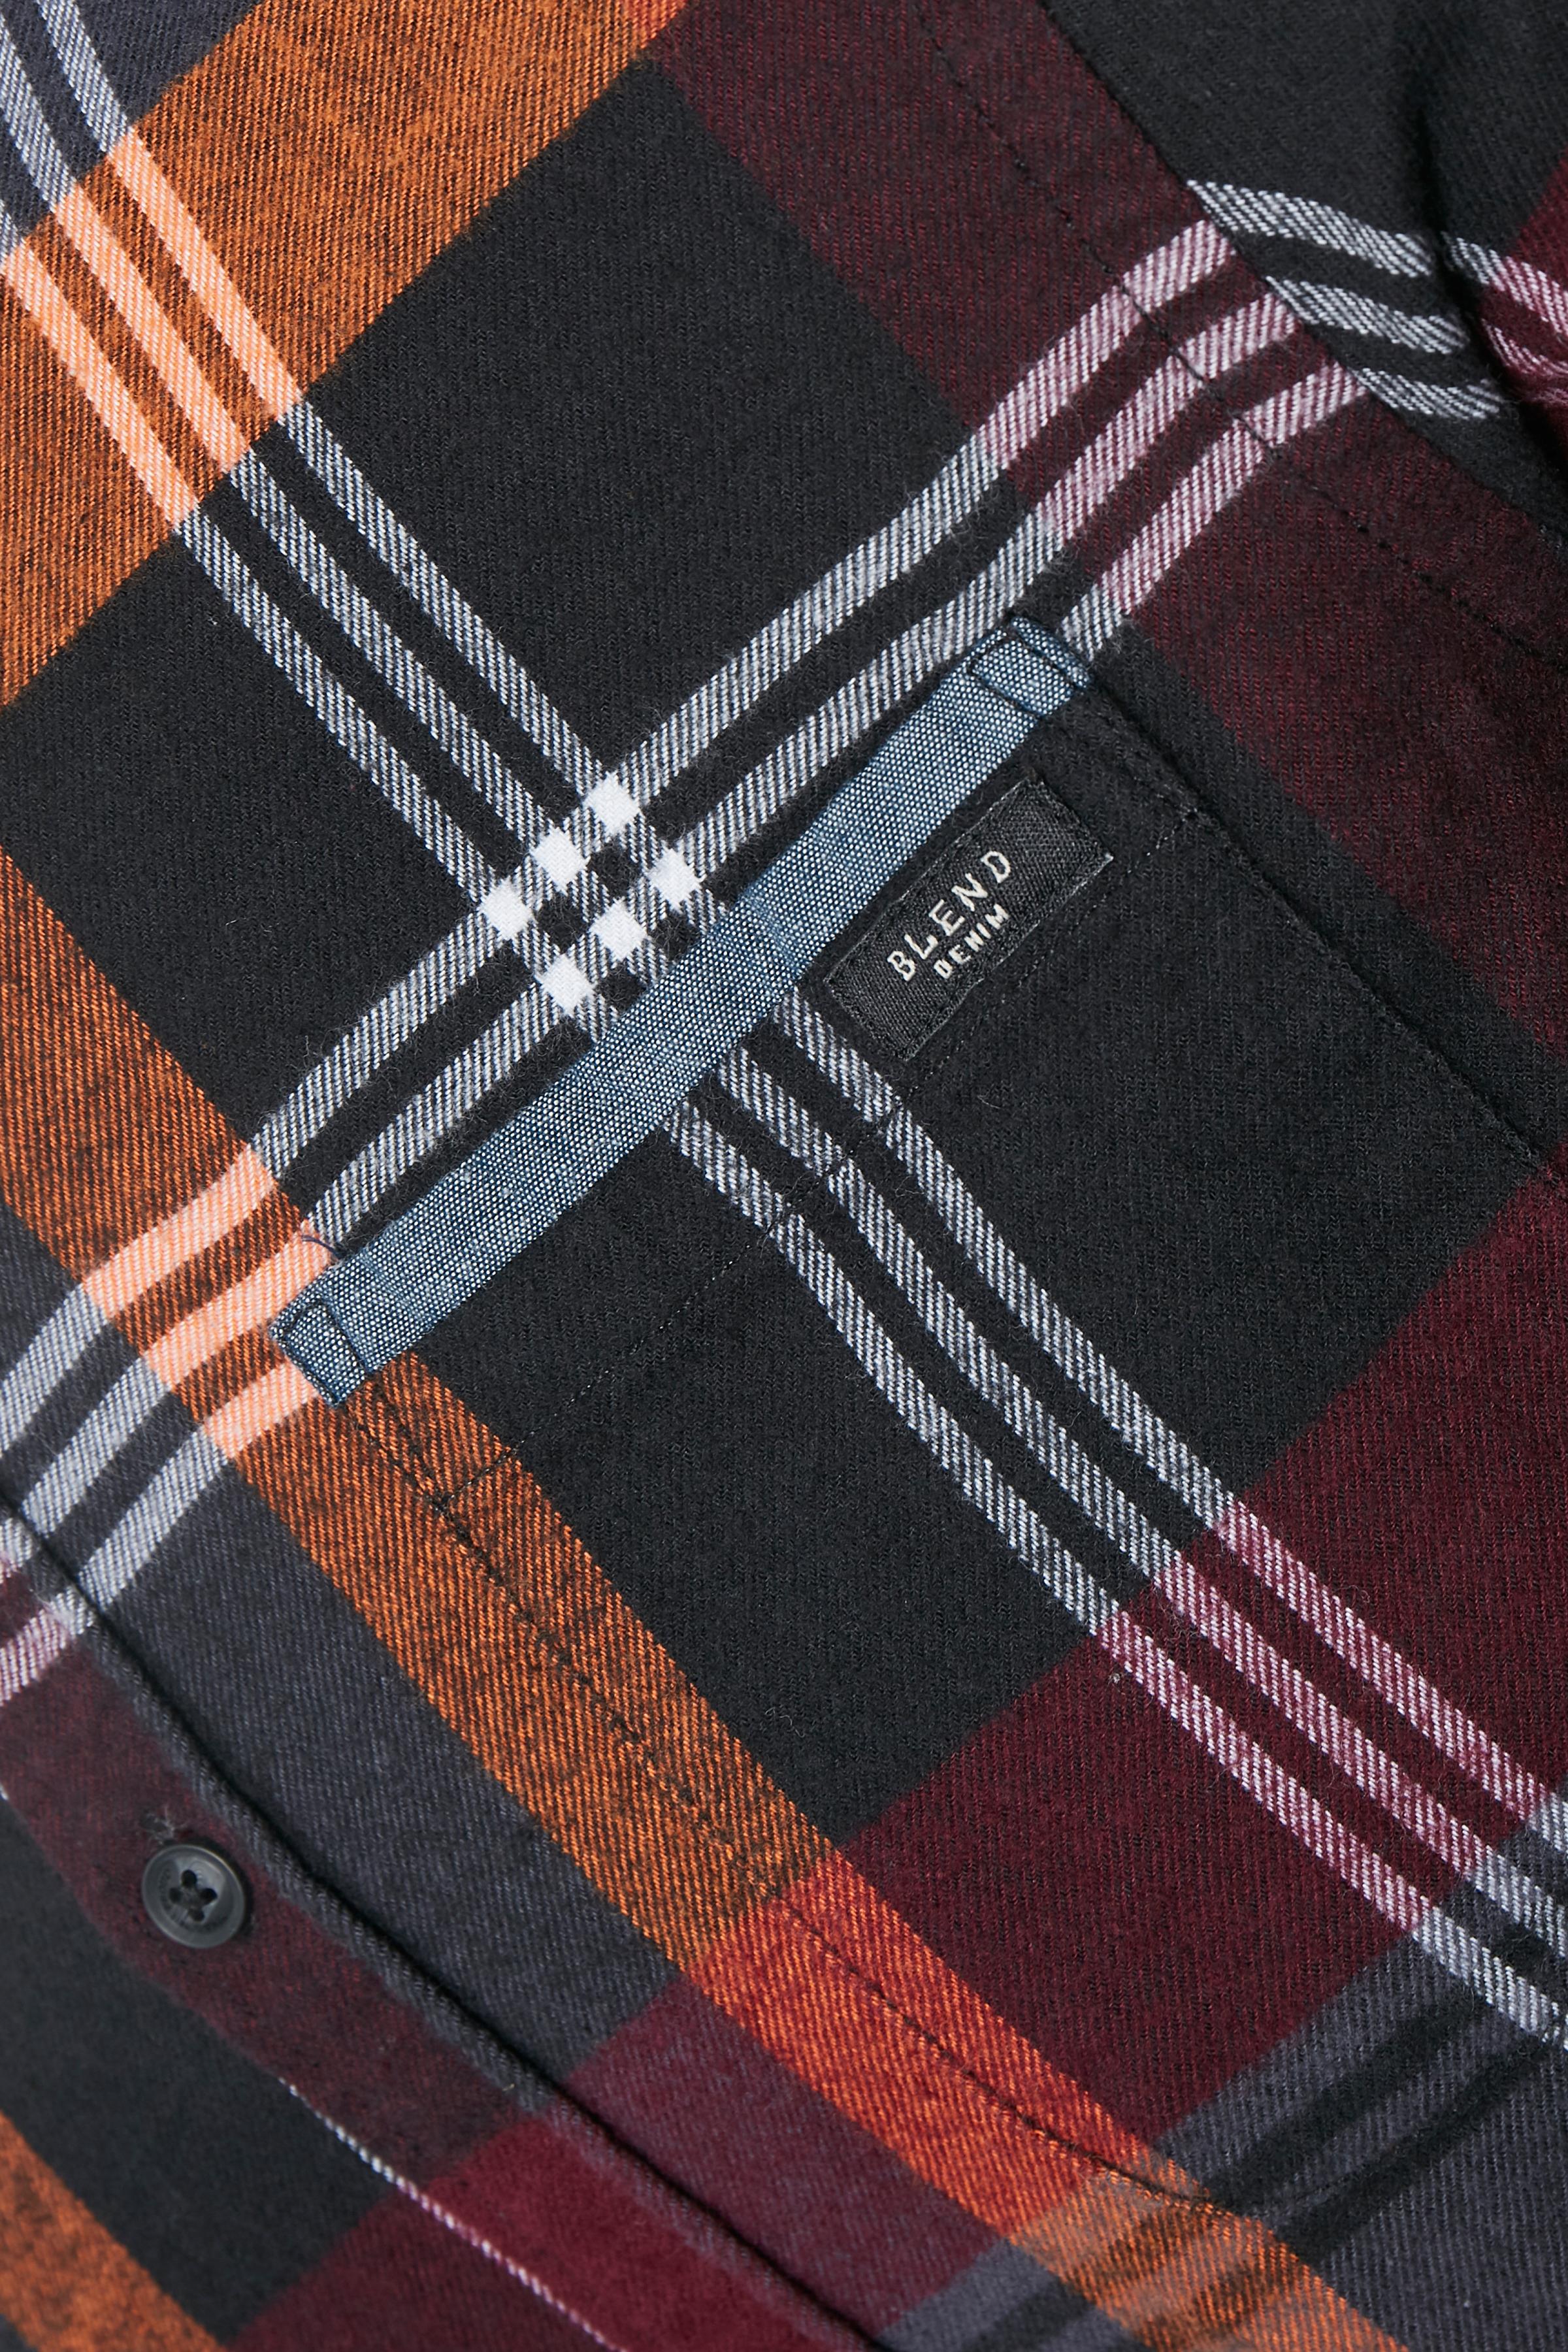 Rødorange Langærmet skjorte fra Blend He – Køb Rødorange Langærmet skjorte fra str. S-3XL her